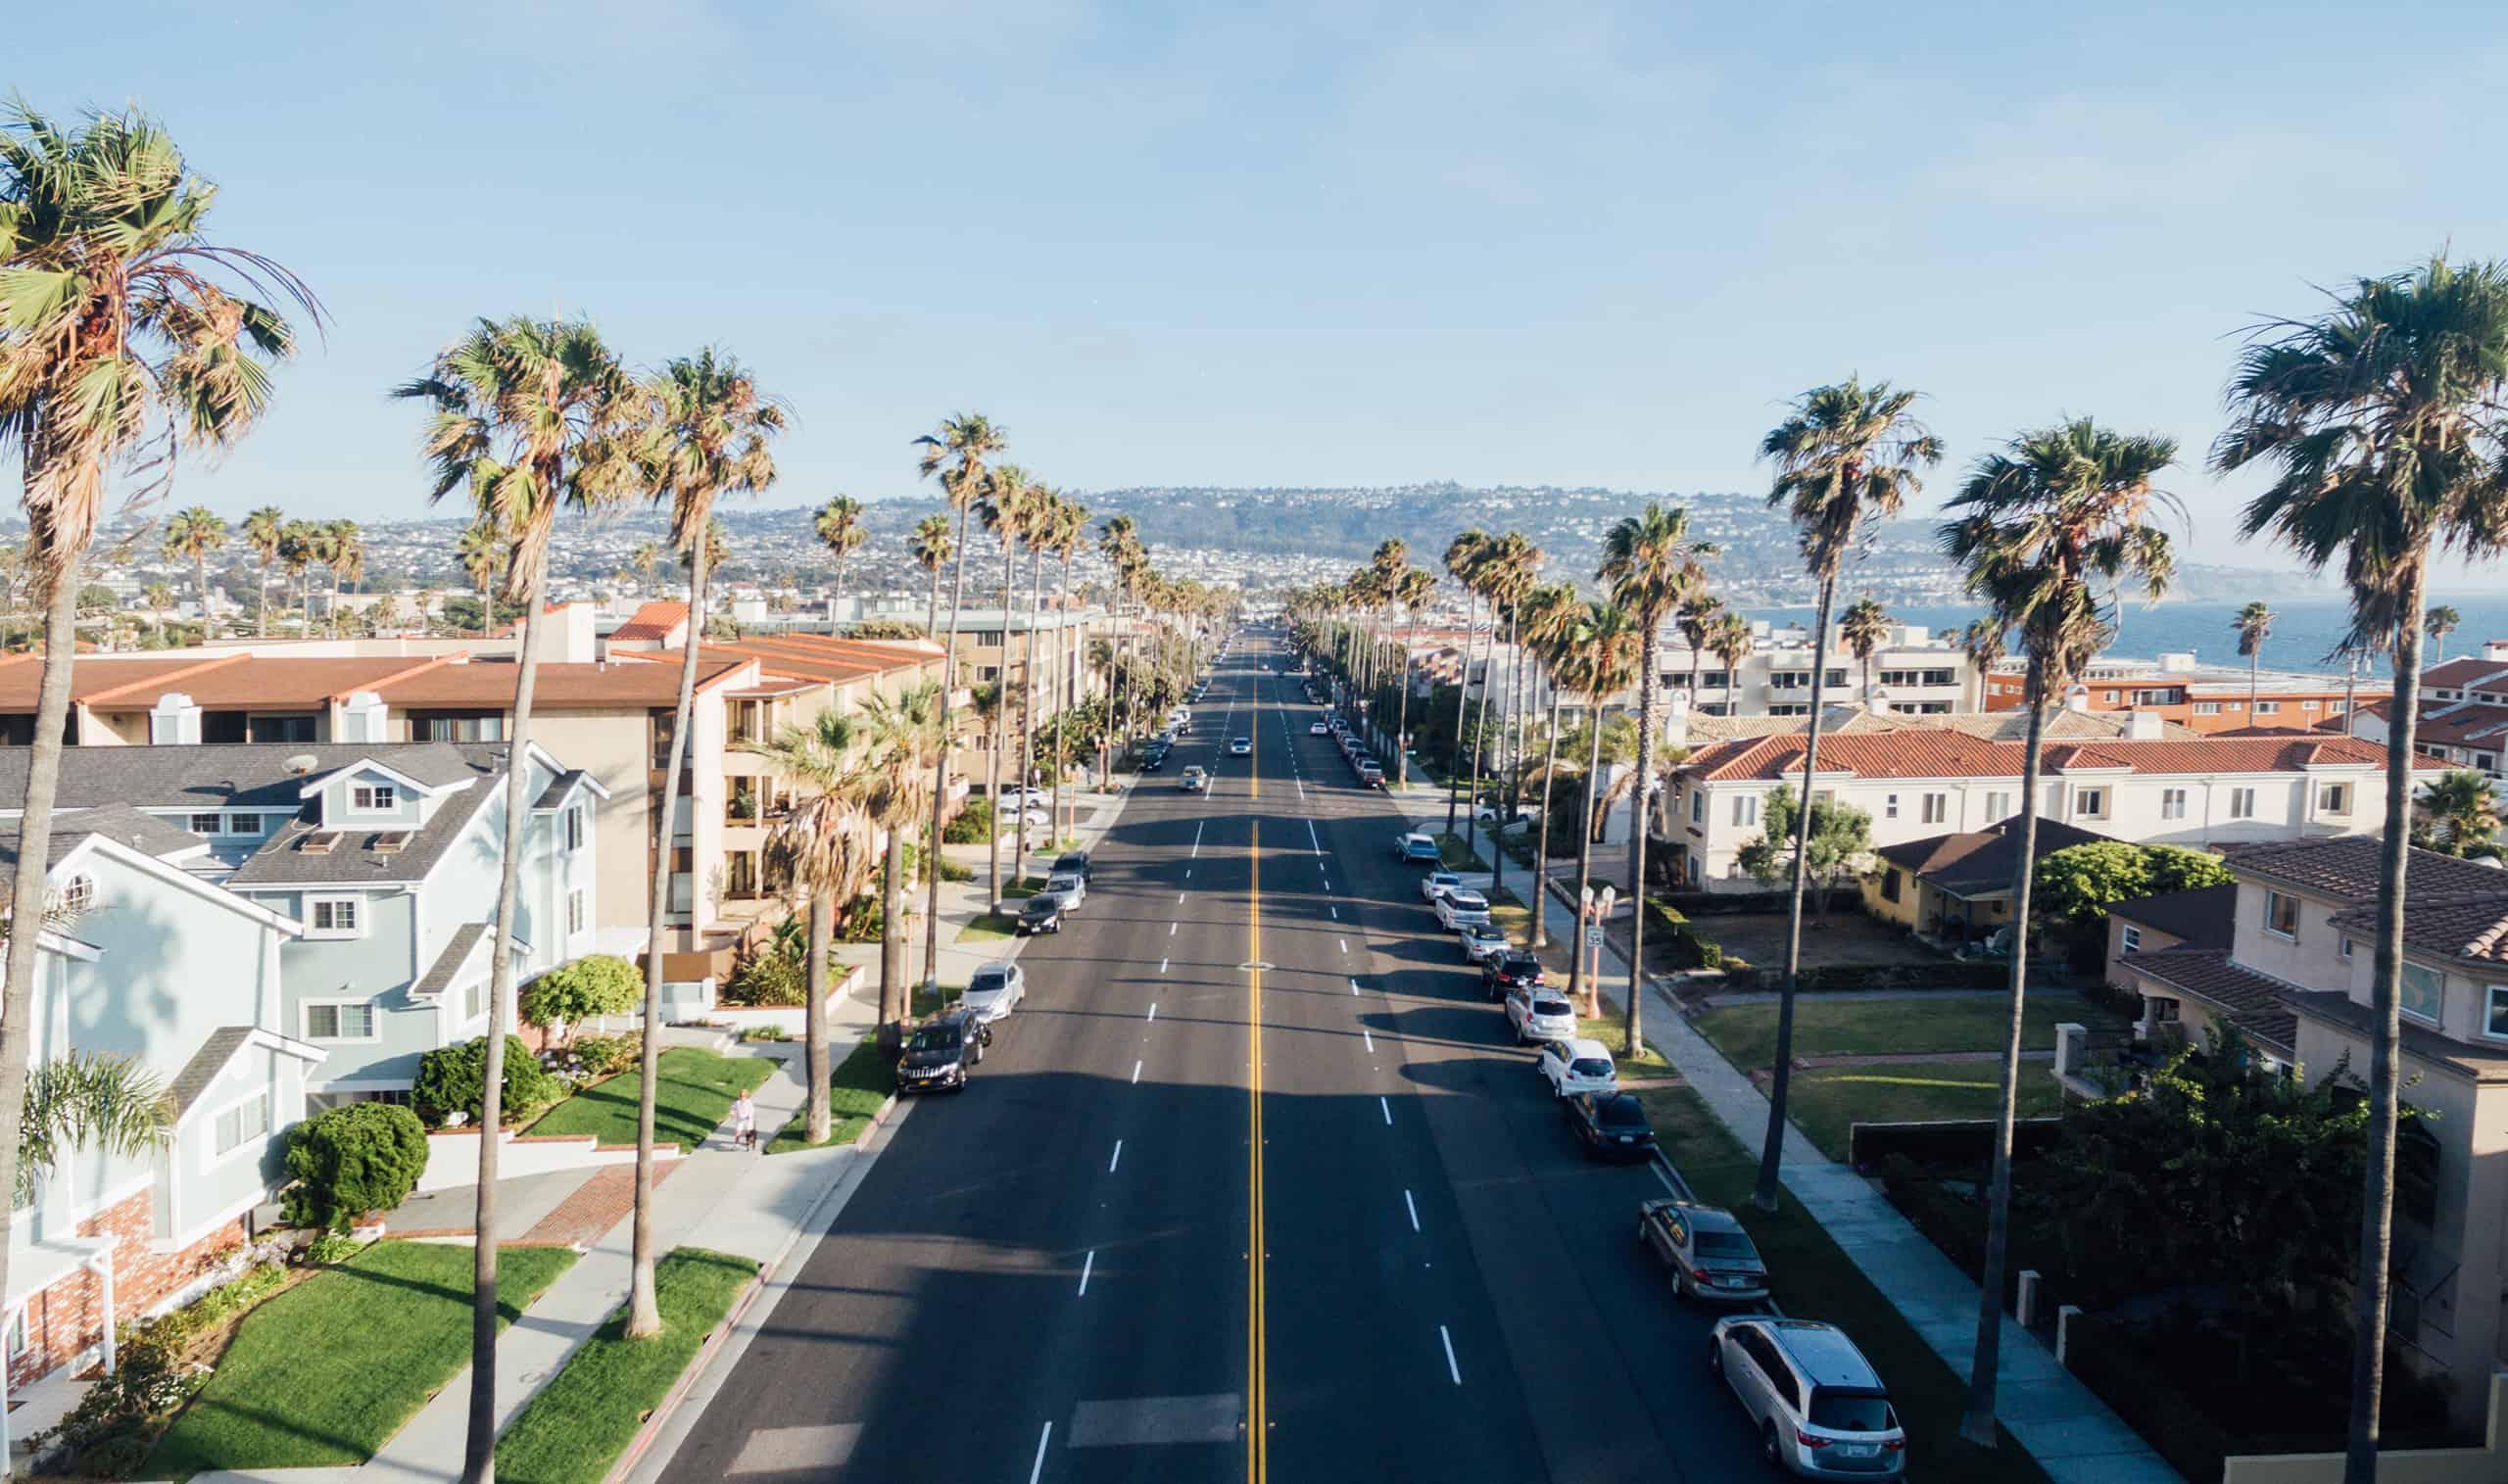 california battleground state